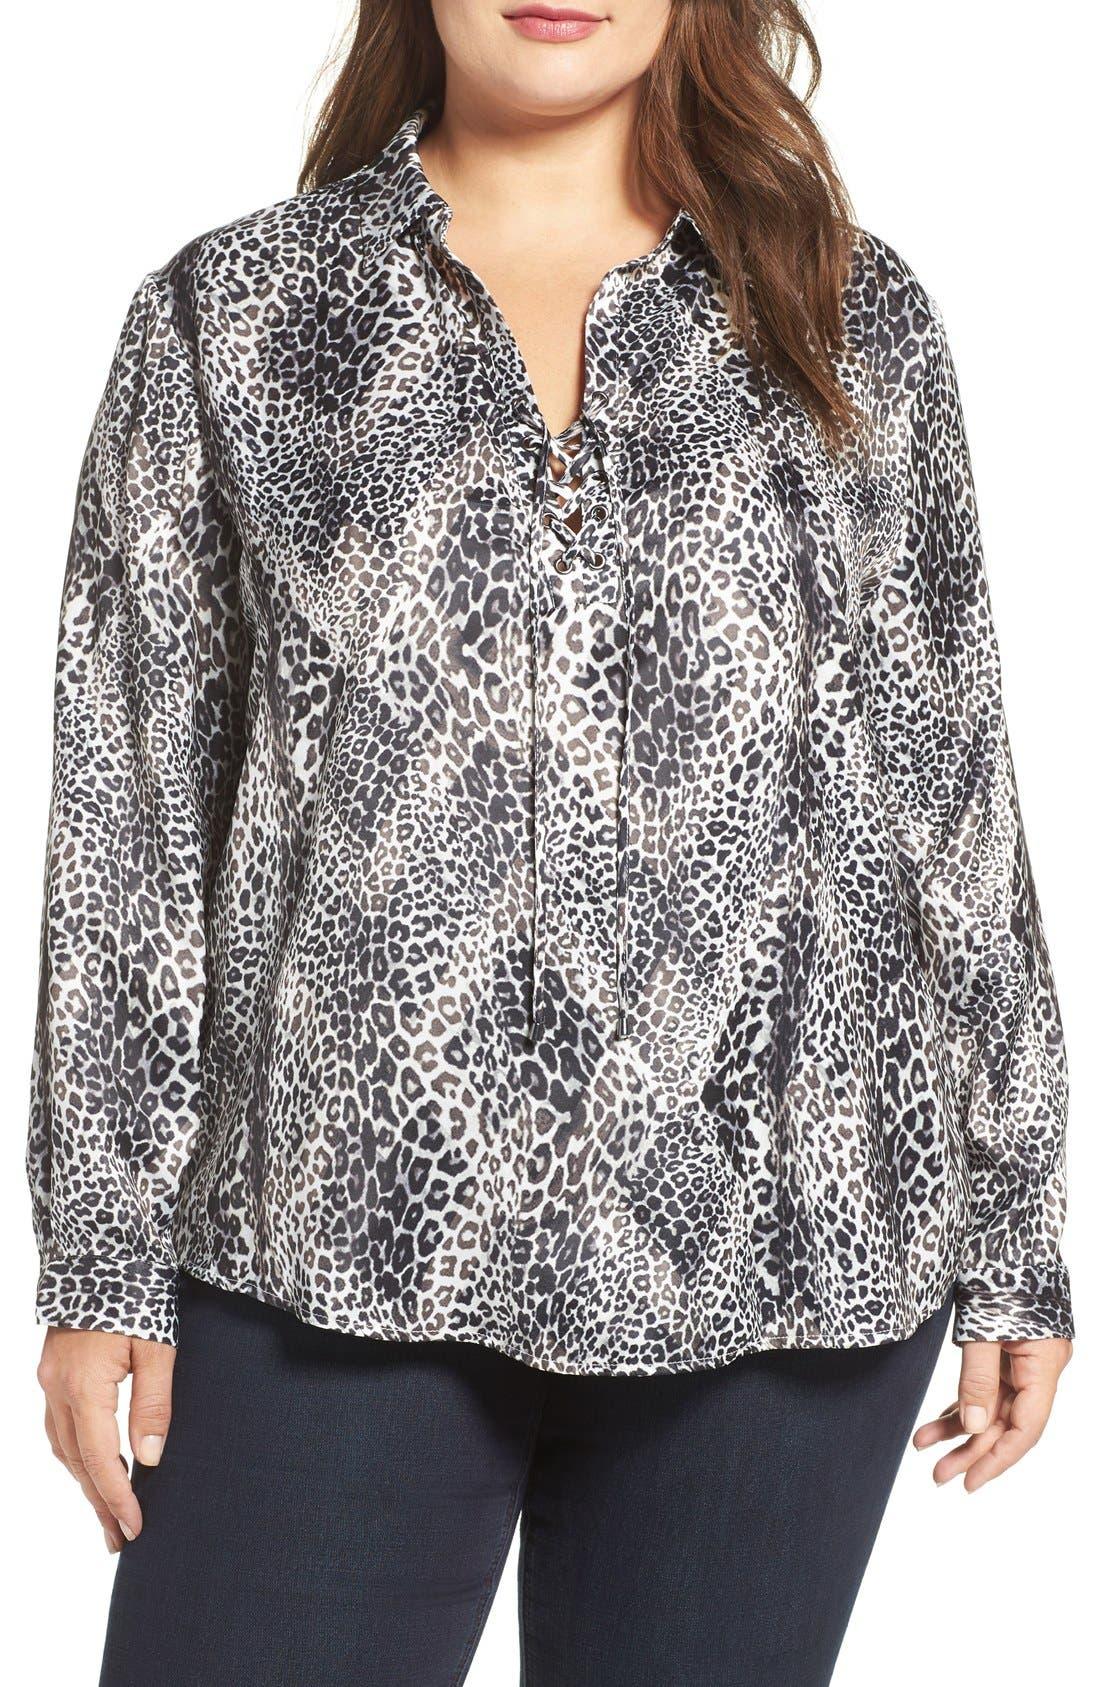 Georgia Lace-Up Blouse,                         Main,                         color, Leopard Overlay